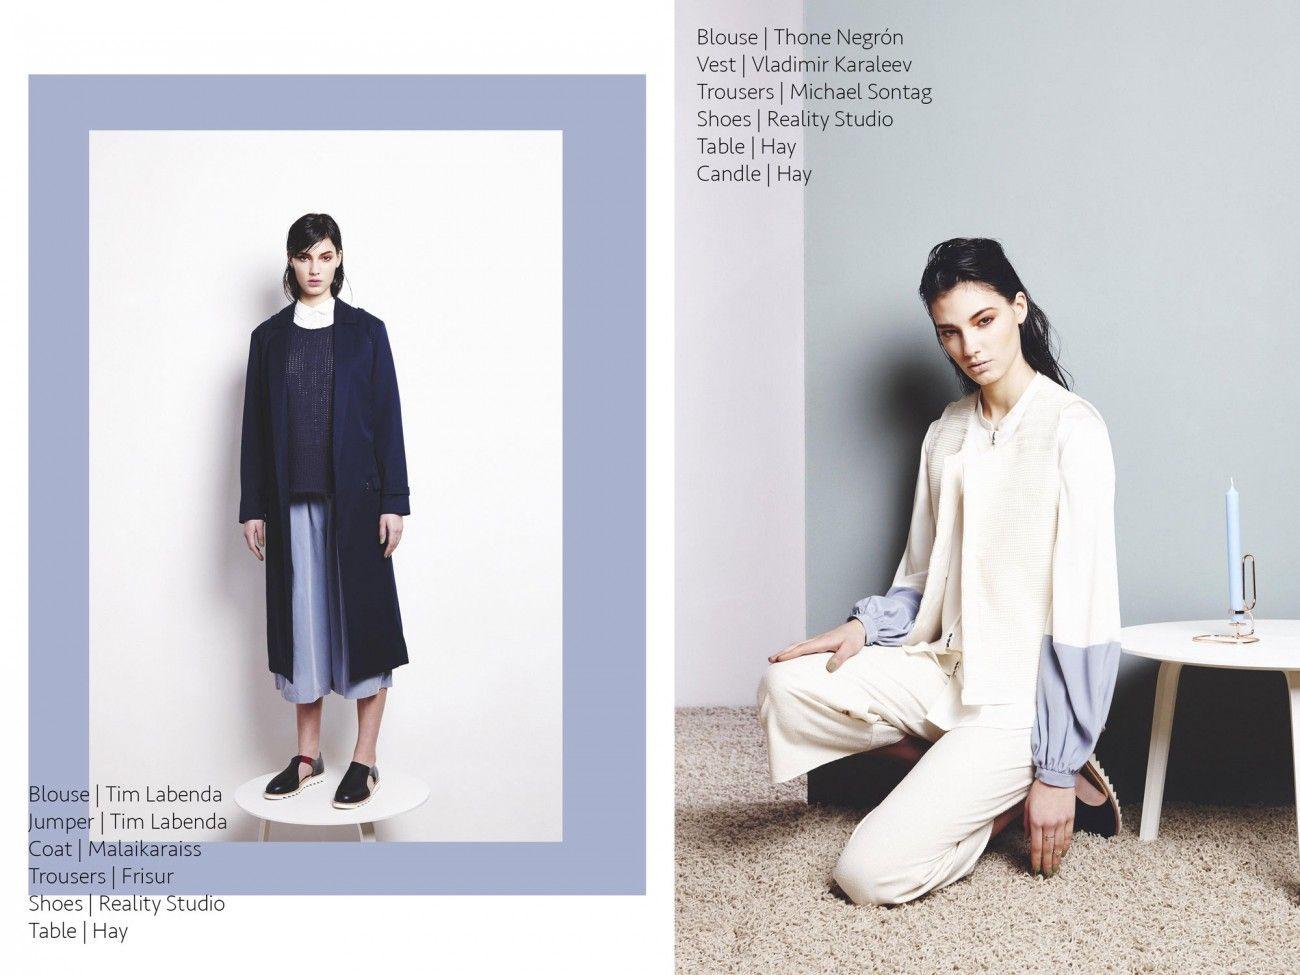 VLADIMIR KARALEEV in OE Magazine Photography: Jennifer Endom // Styling: Anna Sourminskaja